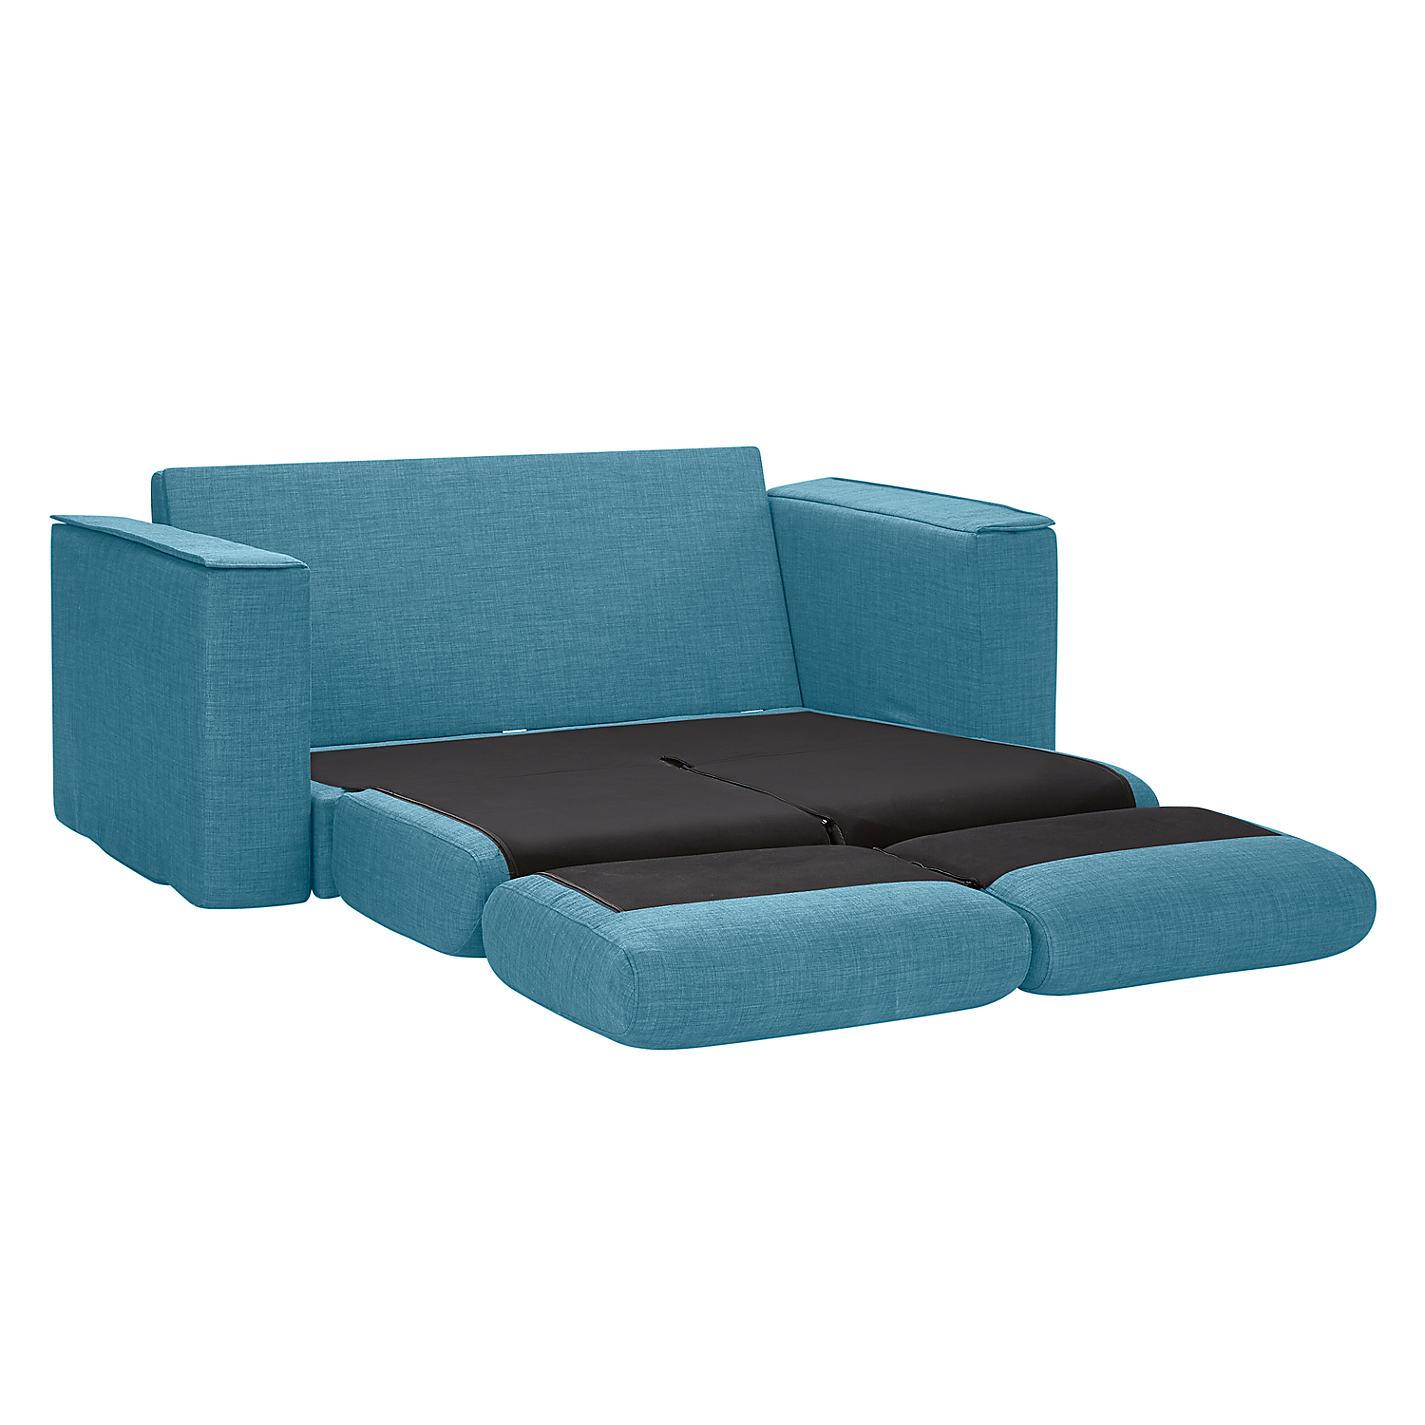 Buy John Lewis Quattro Storage Sofa Bed with Foam Mattress